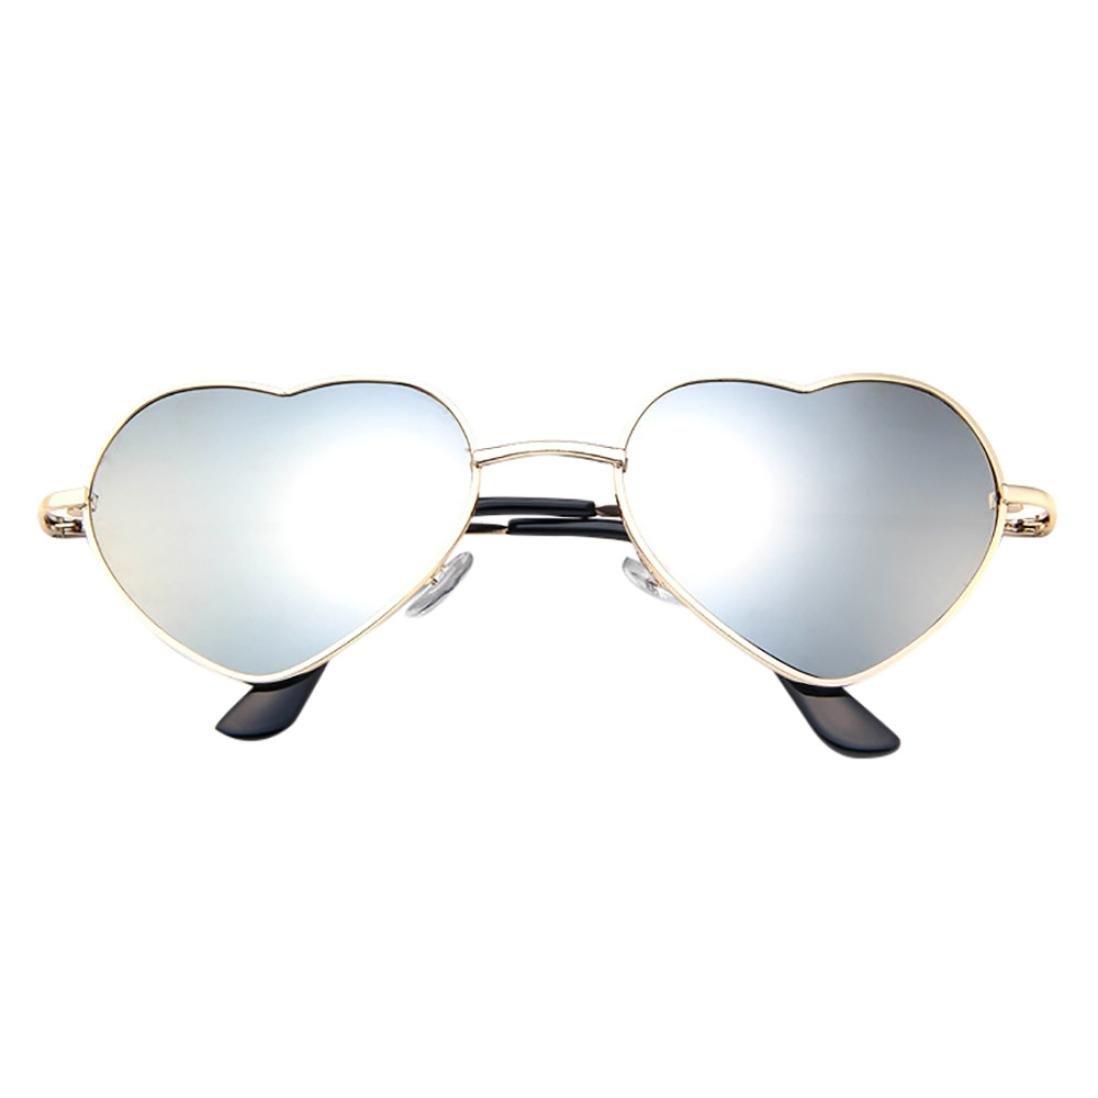 Brillen,Trada Mens Damen Metallrahmen Damen Herzform Sonnenbrille ...